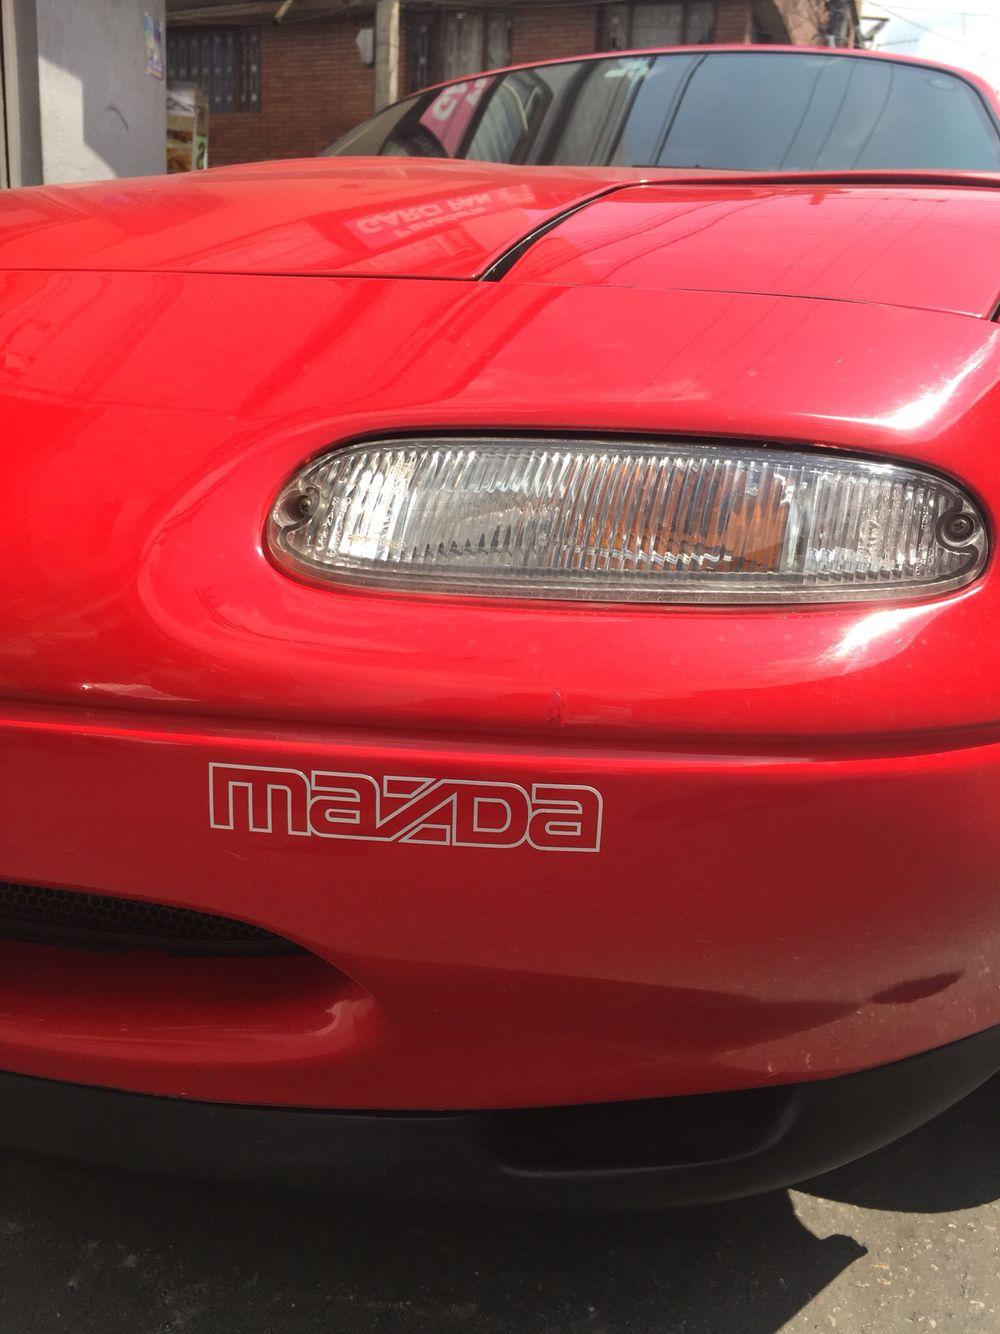 Original bumper 1991 mazda miata sticker decal